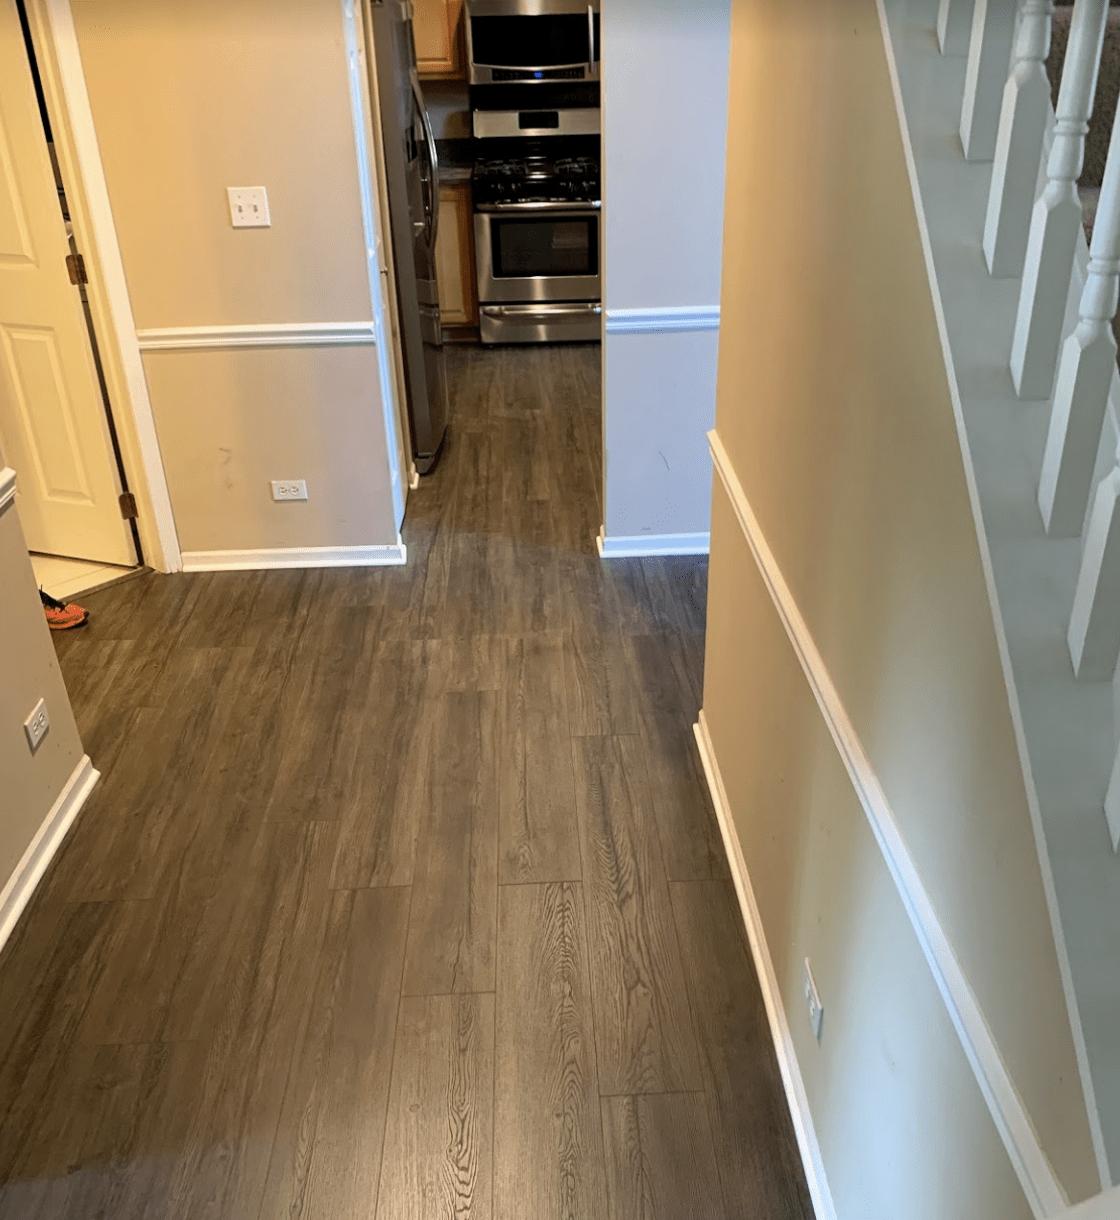 New flooring installation in Palatine, IL from Alpha Carpet & Flooring